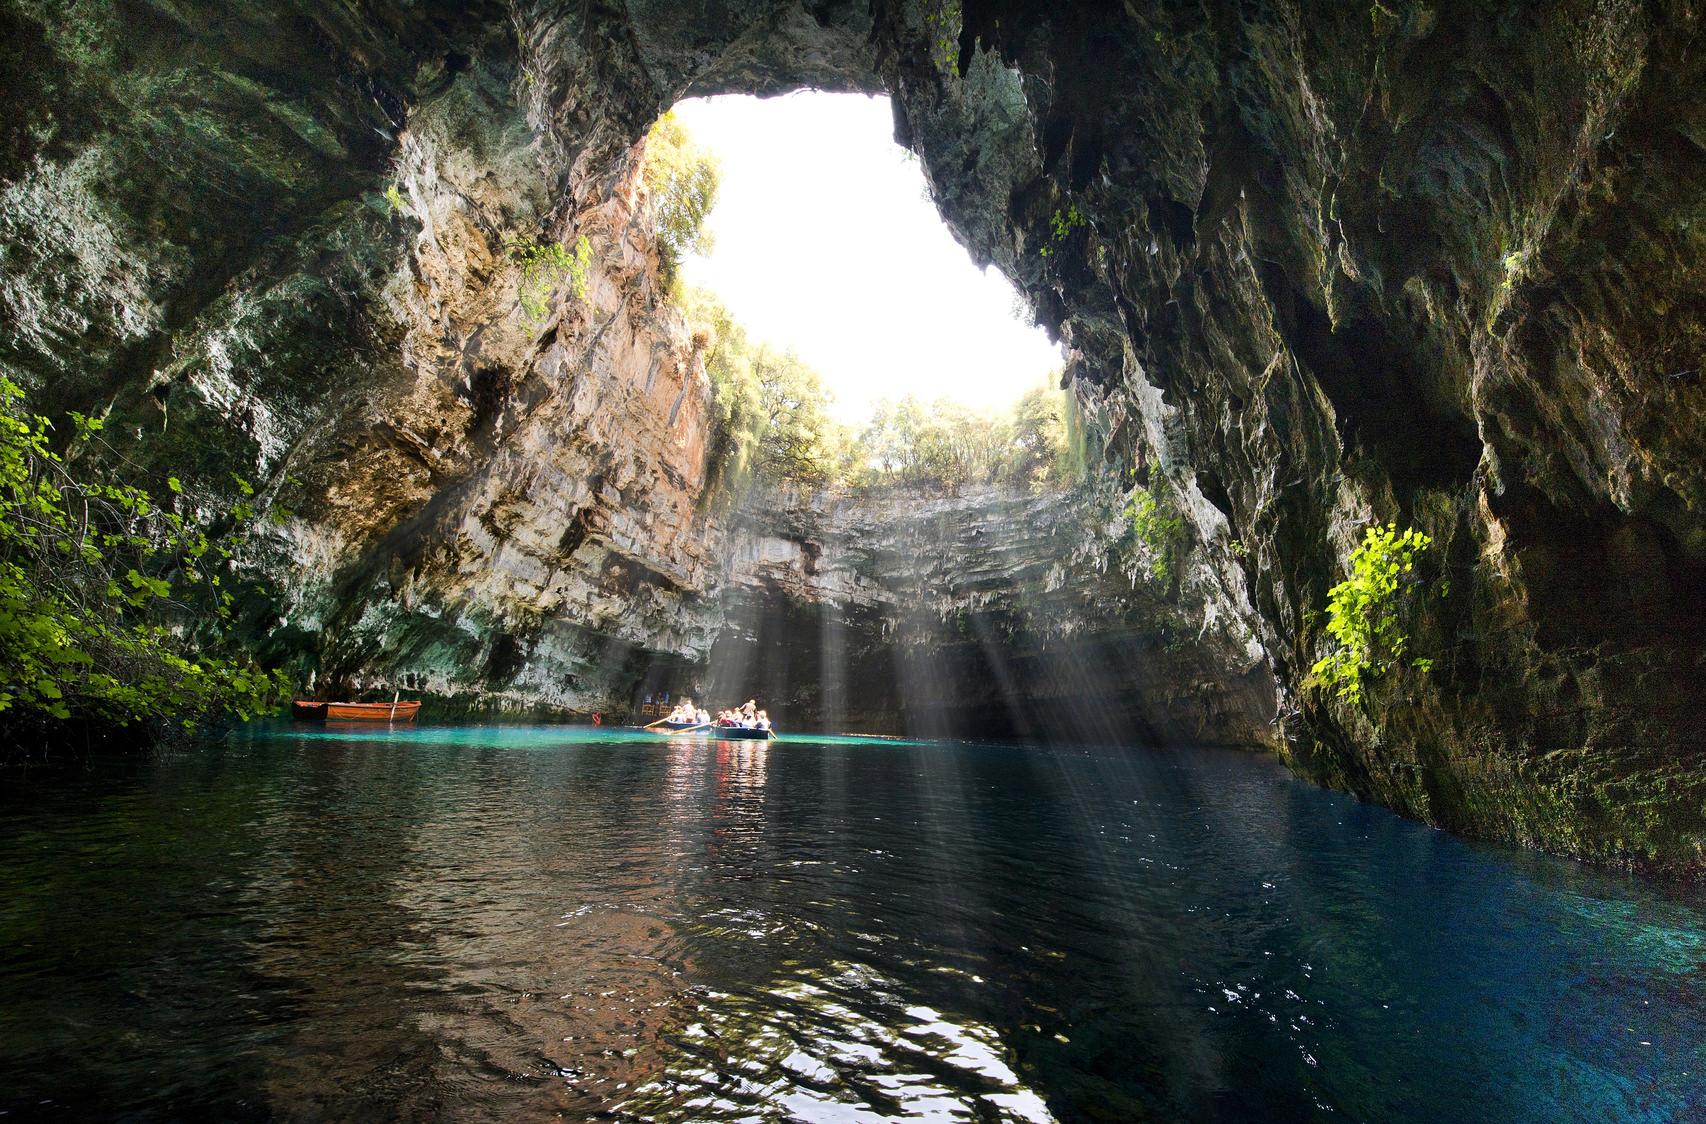 Famous melissani lake on Kefalonia island - GreeceInside famous mellisani lake with on Kefalonia island - GreeceFamous mellisani lake on Kefalonia island - Greece